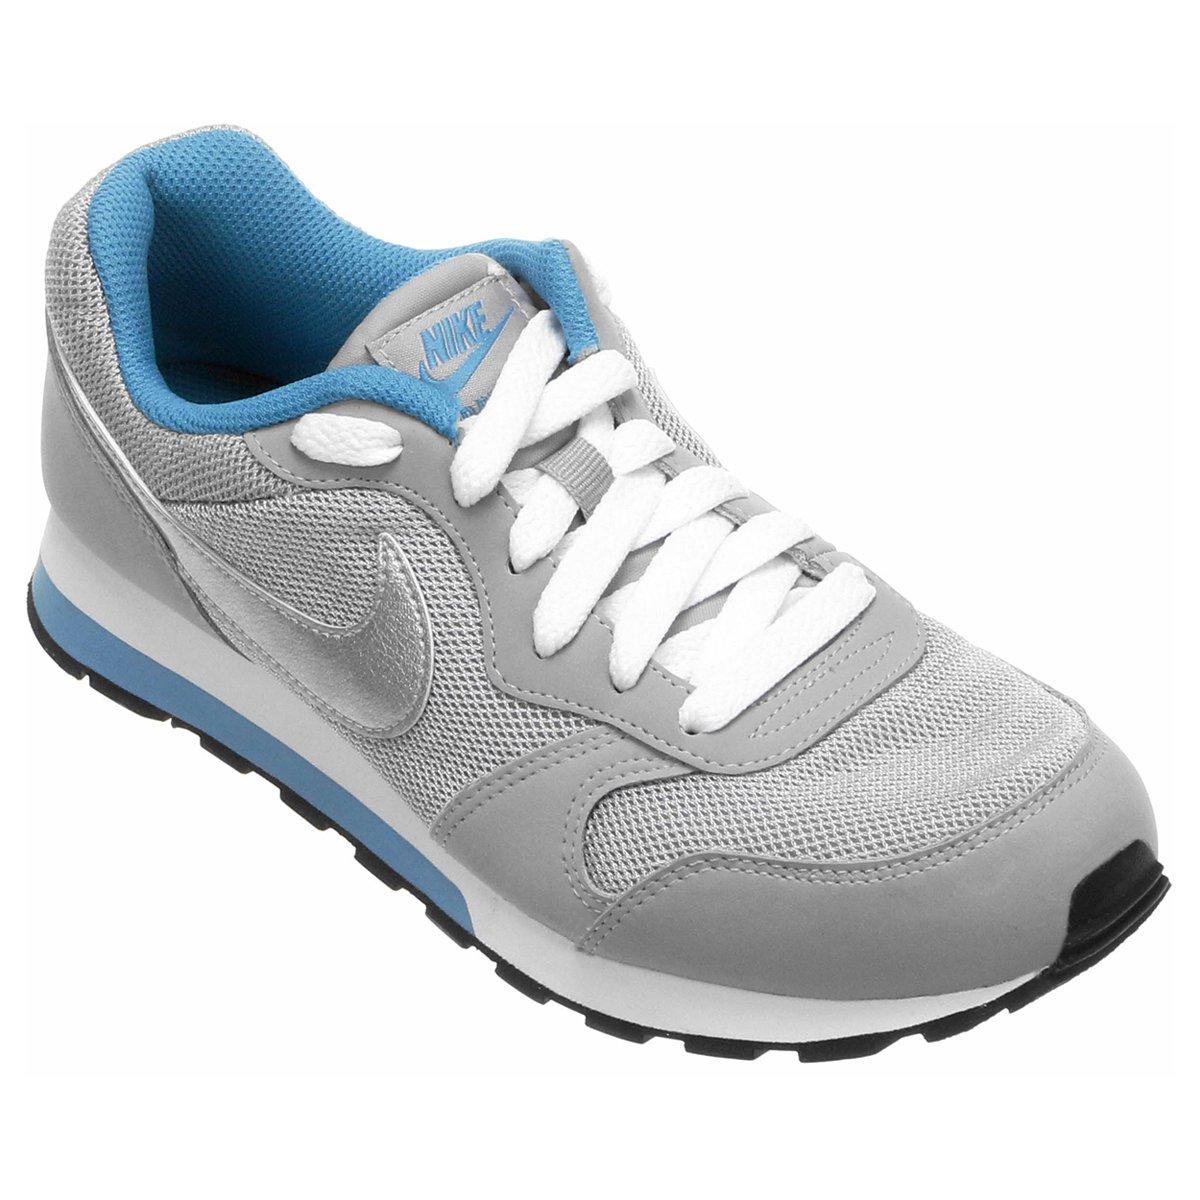 Tênis Infantil Nike Md Runner 2 - Cinza e Azul Claro - Compre Agora ... 8339d74c3965f